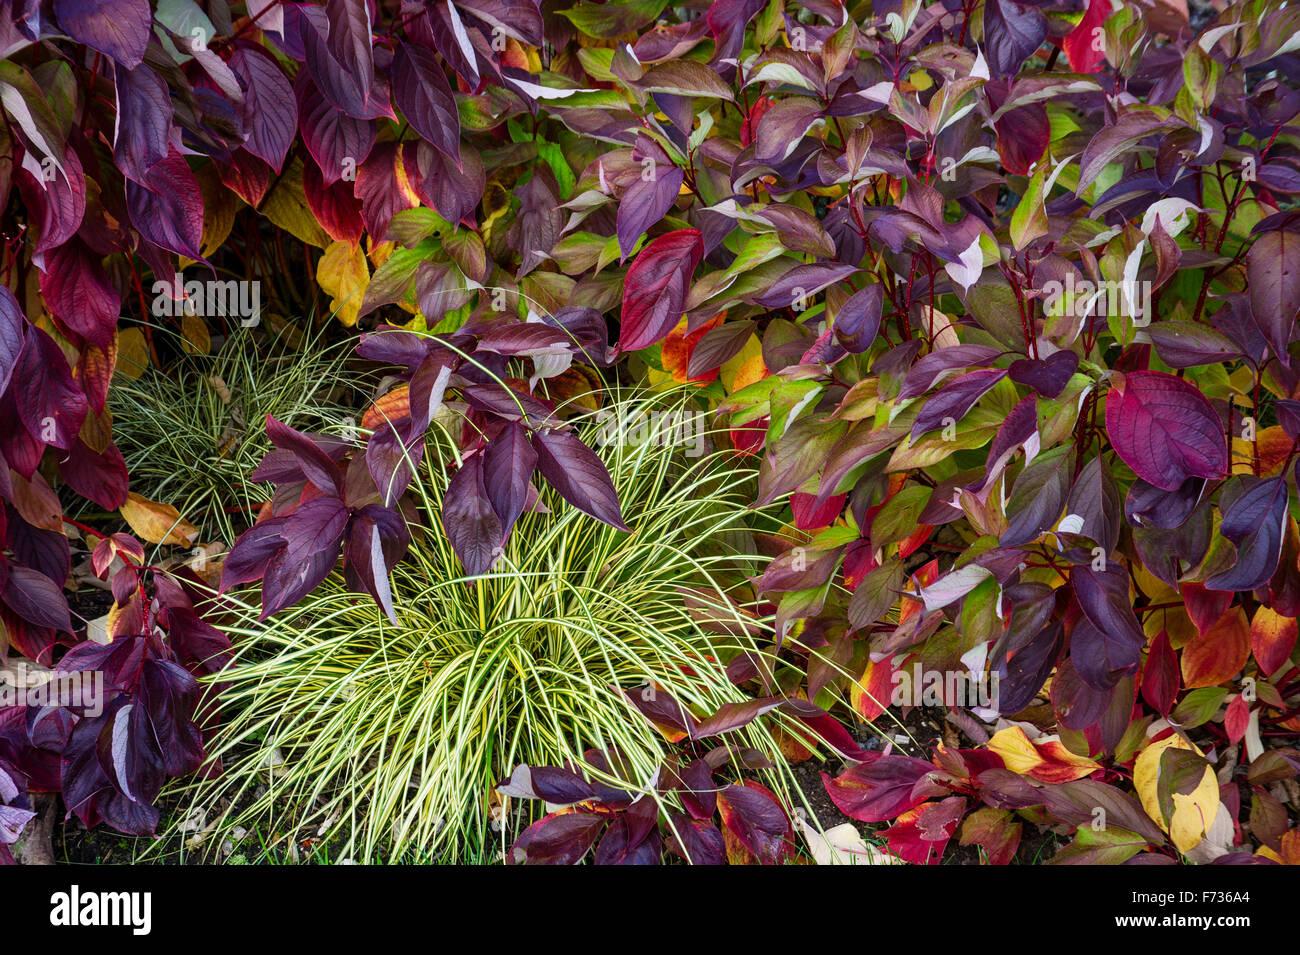 Cornus alba 'Baton Rouge' and Carex Oshimensis ' Evergold' - Stock Image